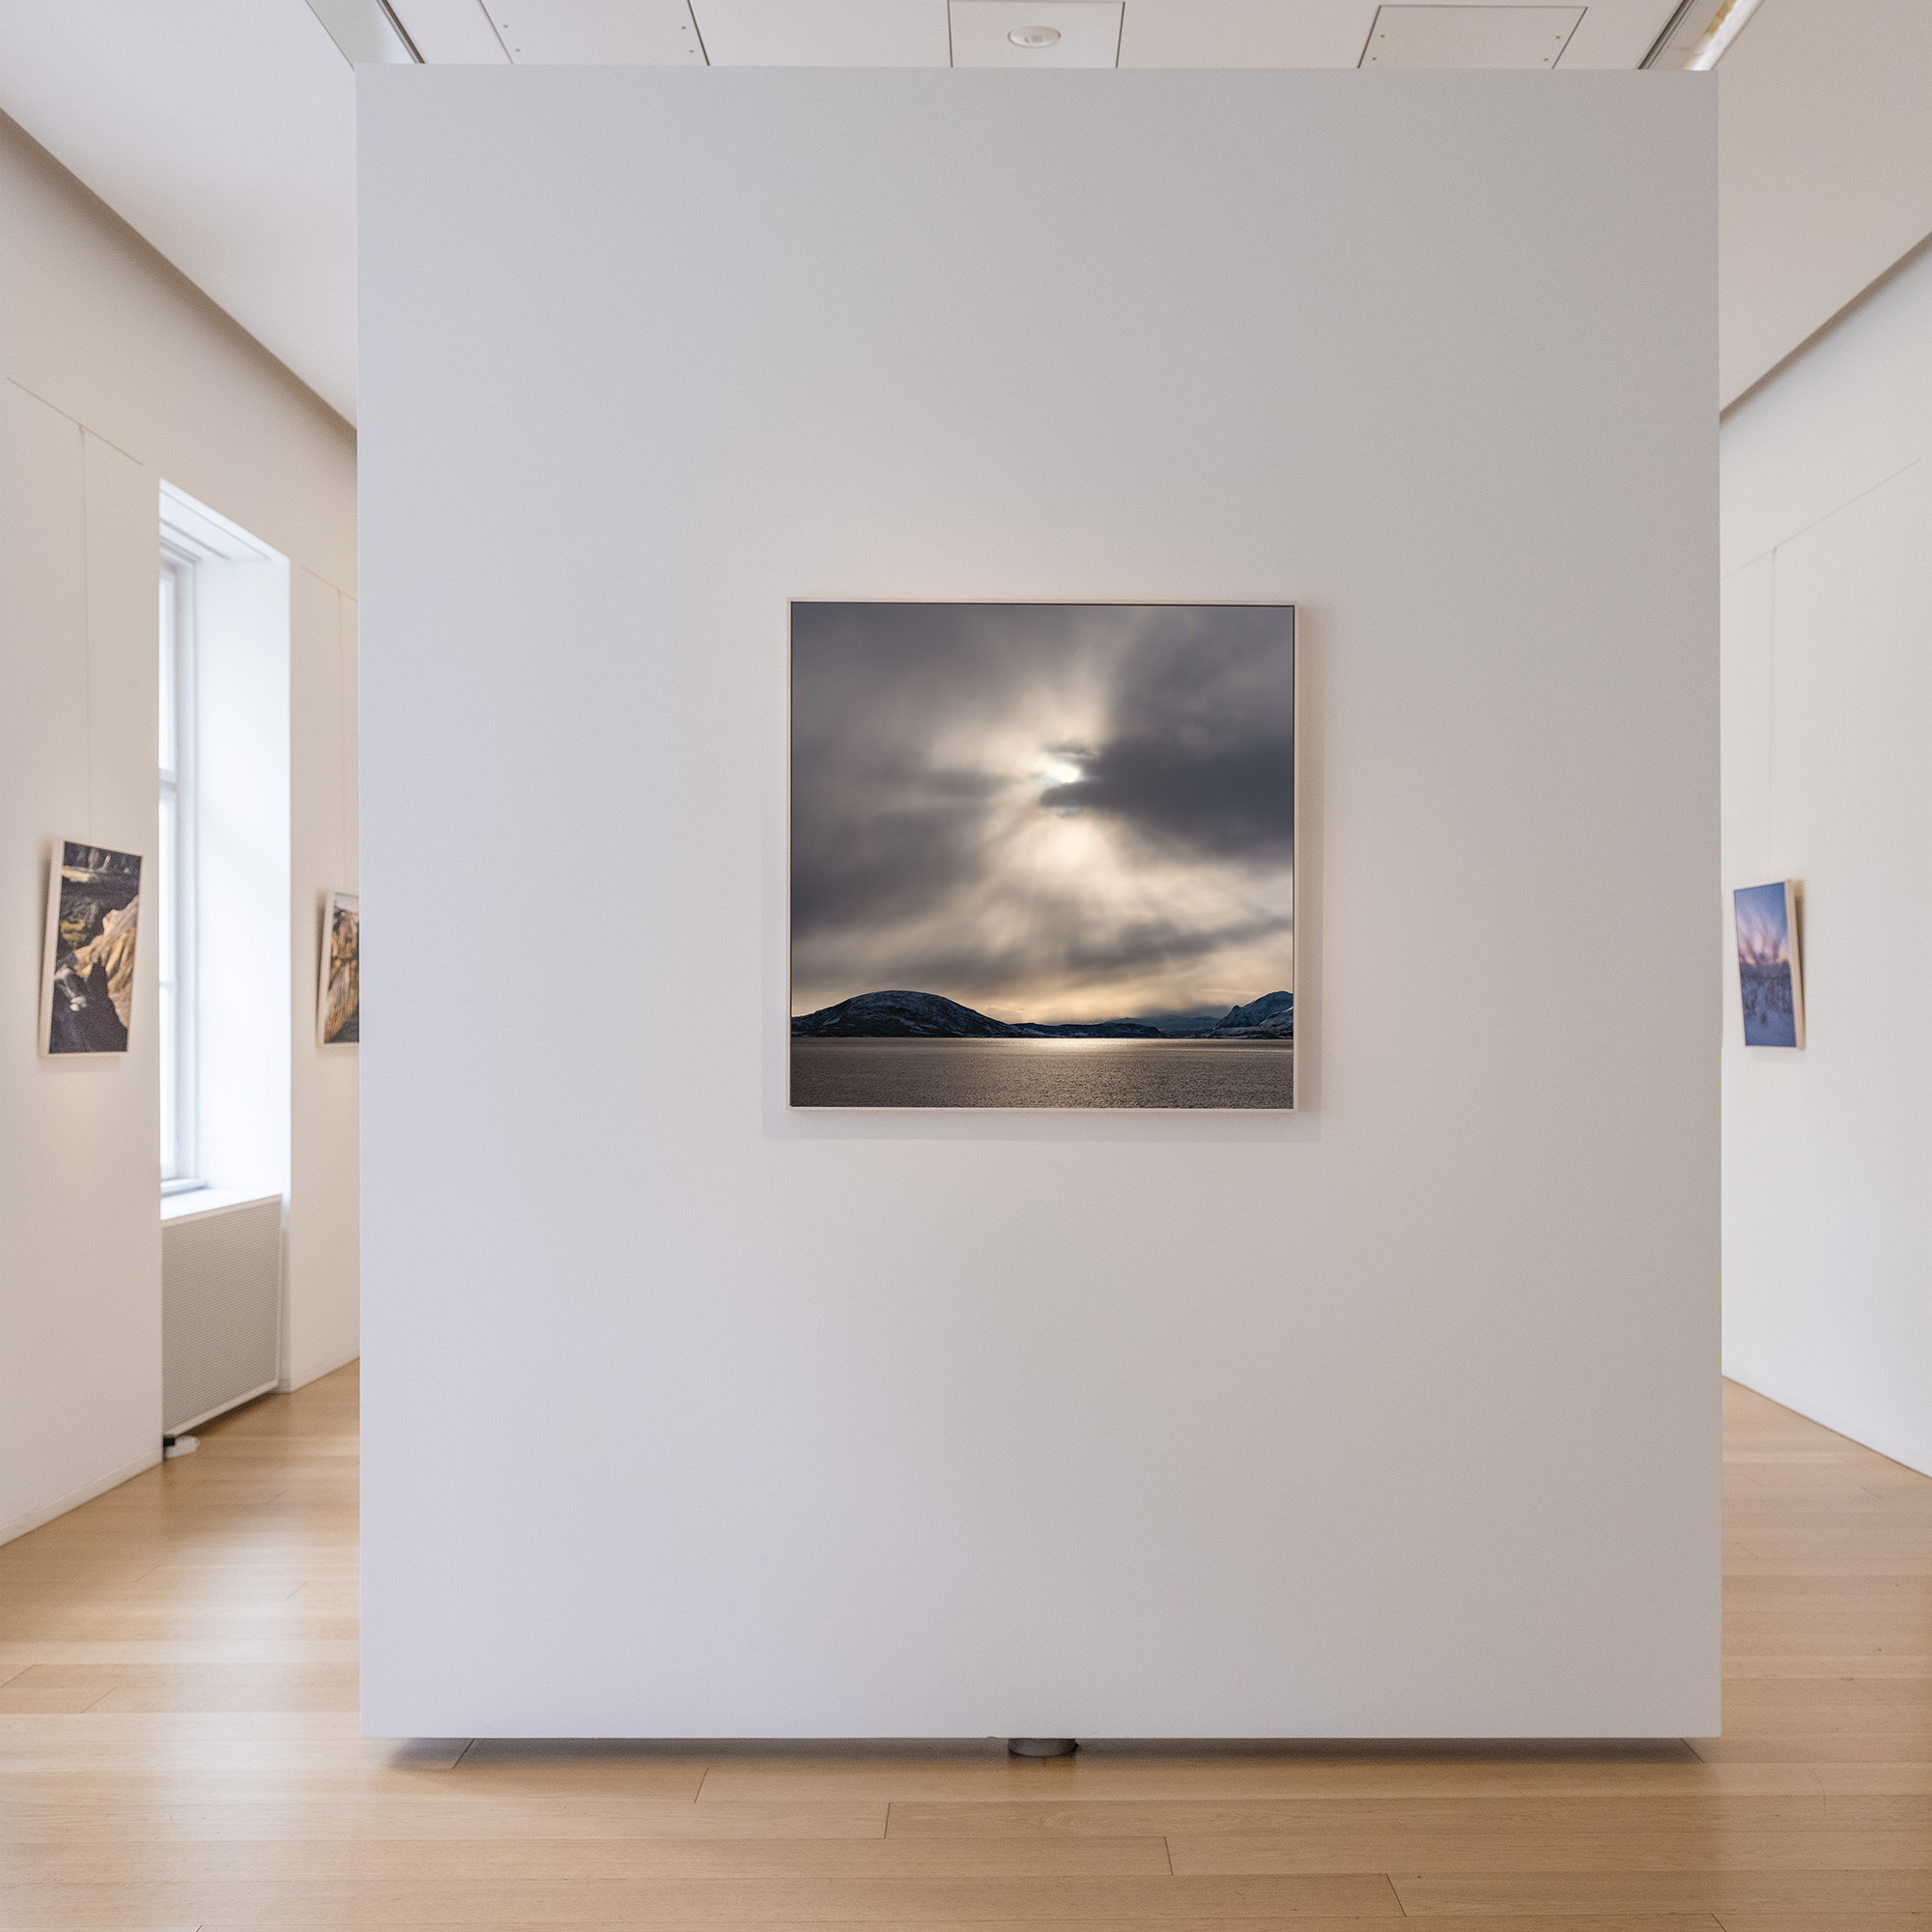 Jan Scheffler, KLV Art, 2019